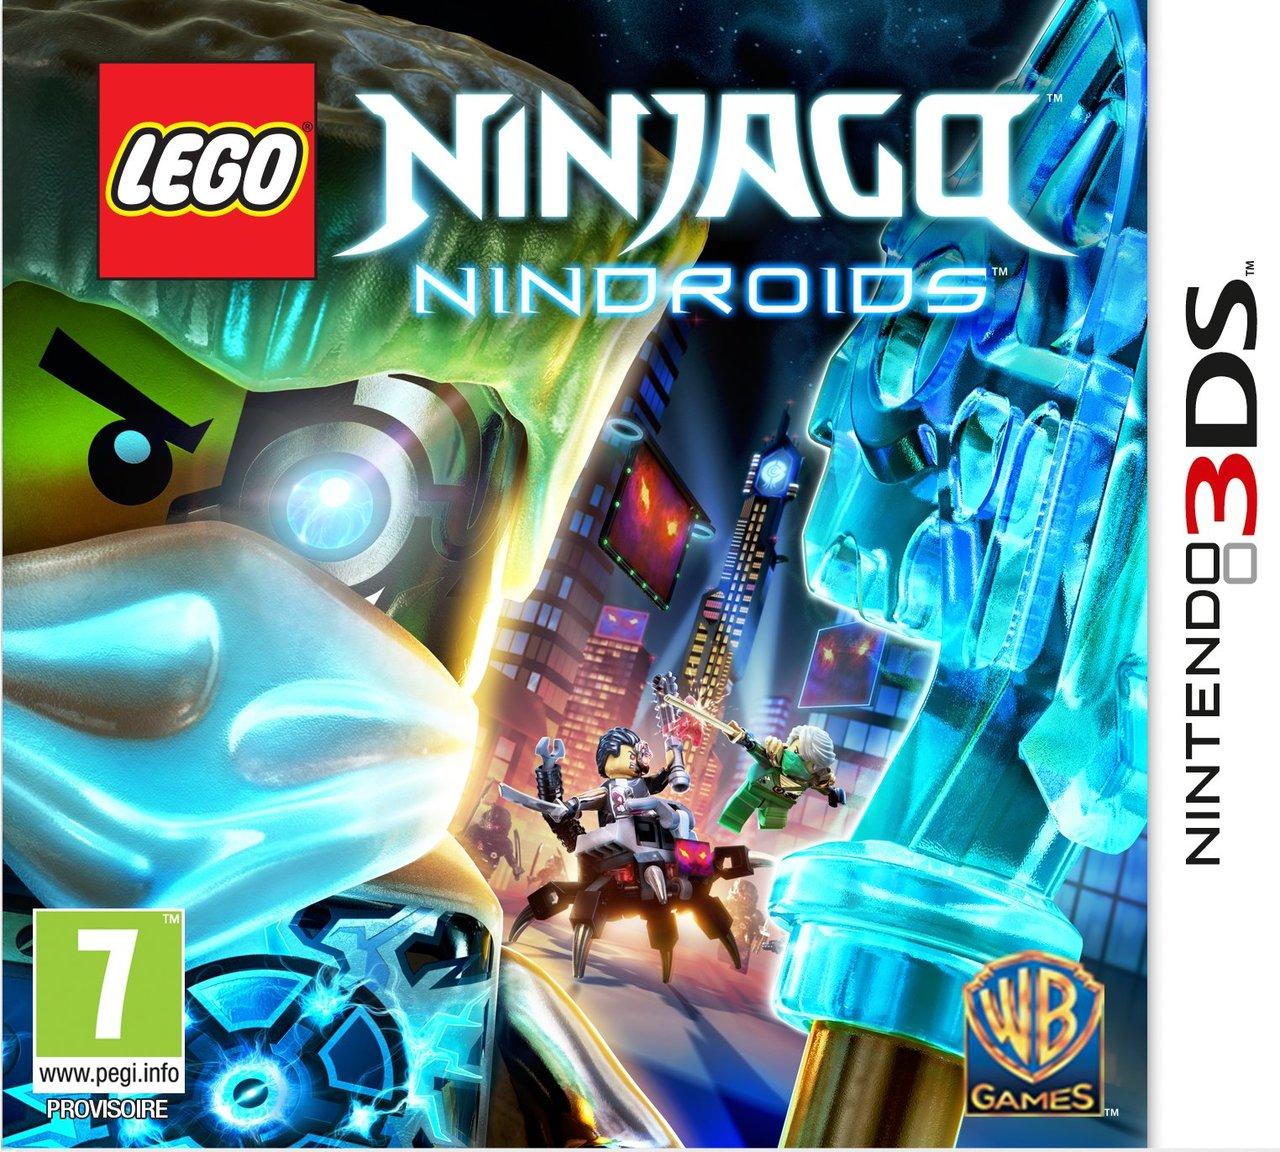 lego ninjago nindrods sur nintendo 3ds jeuxvideocom